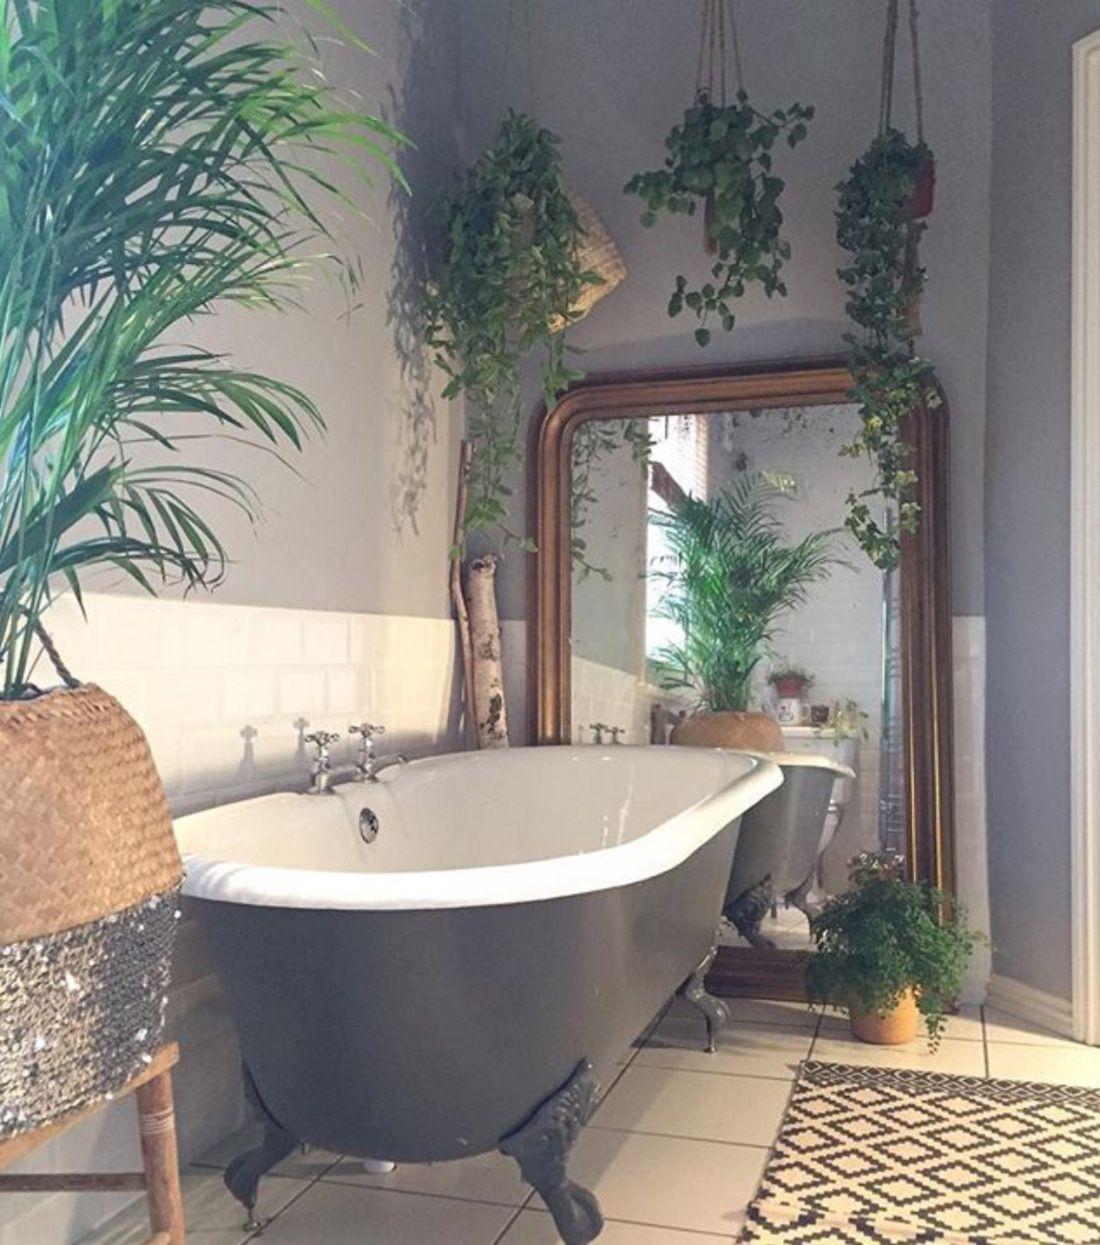 house of instagram bathroom ideas and inspiration bathroom plants bathroom home d cor. Black Bedroom Furniture Sets. Home Design Ideas